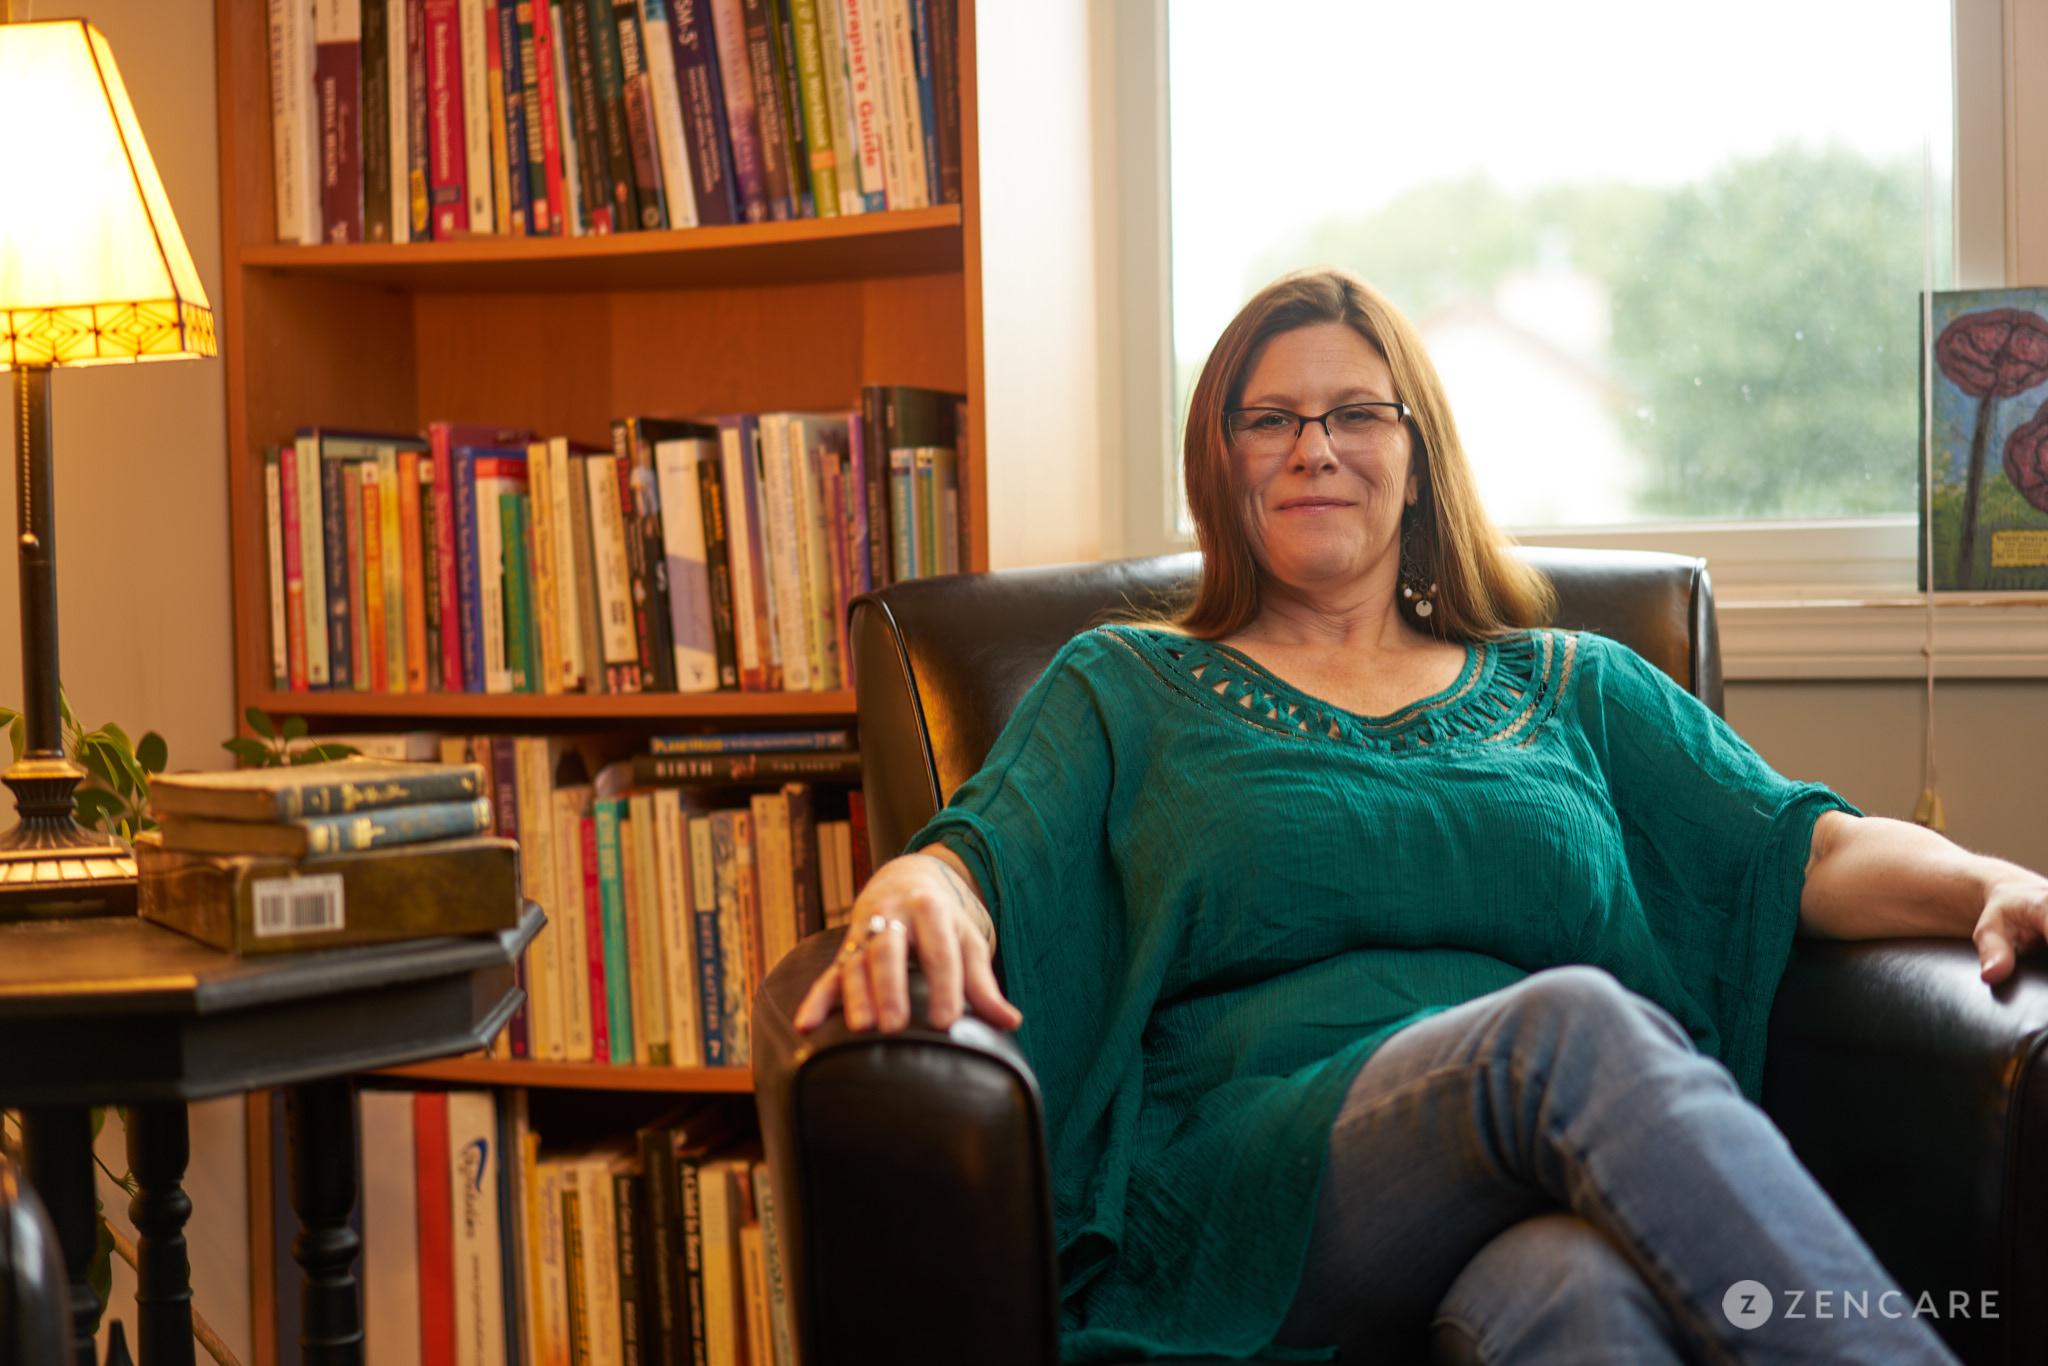 Sarah Knight, LMHC - Counselor in North Kingstown RI -3.jpg